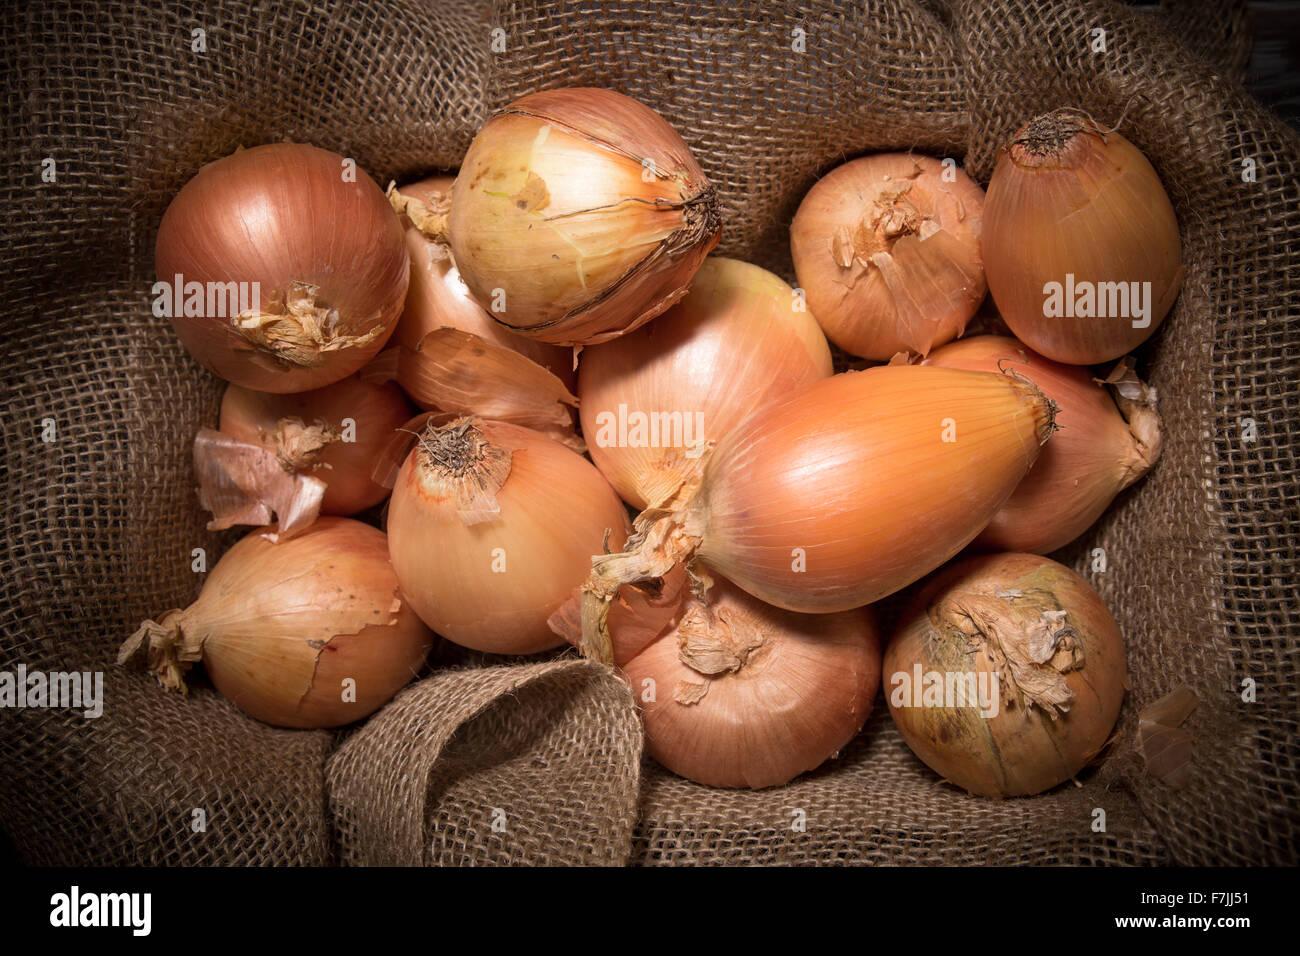 burlap sack of yellow onions - Stock Image